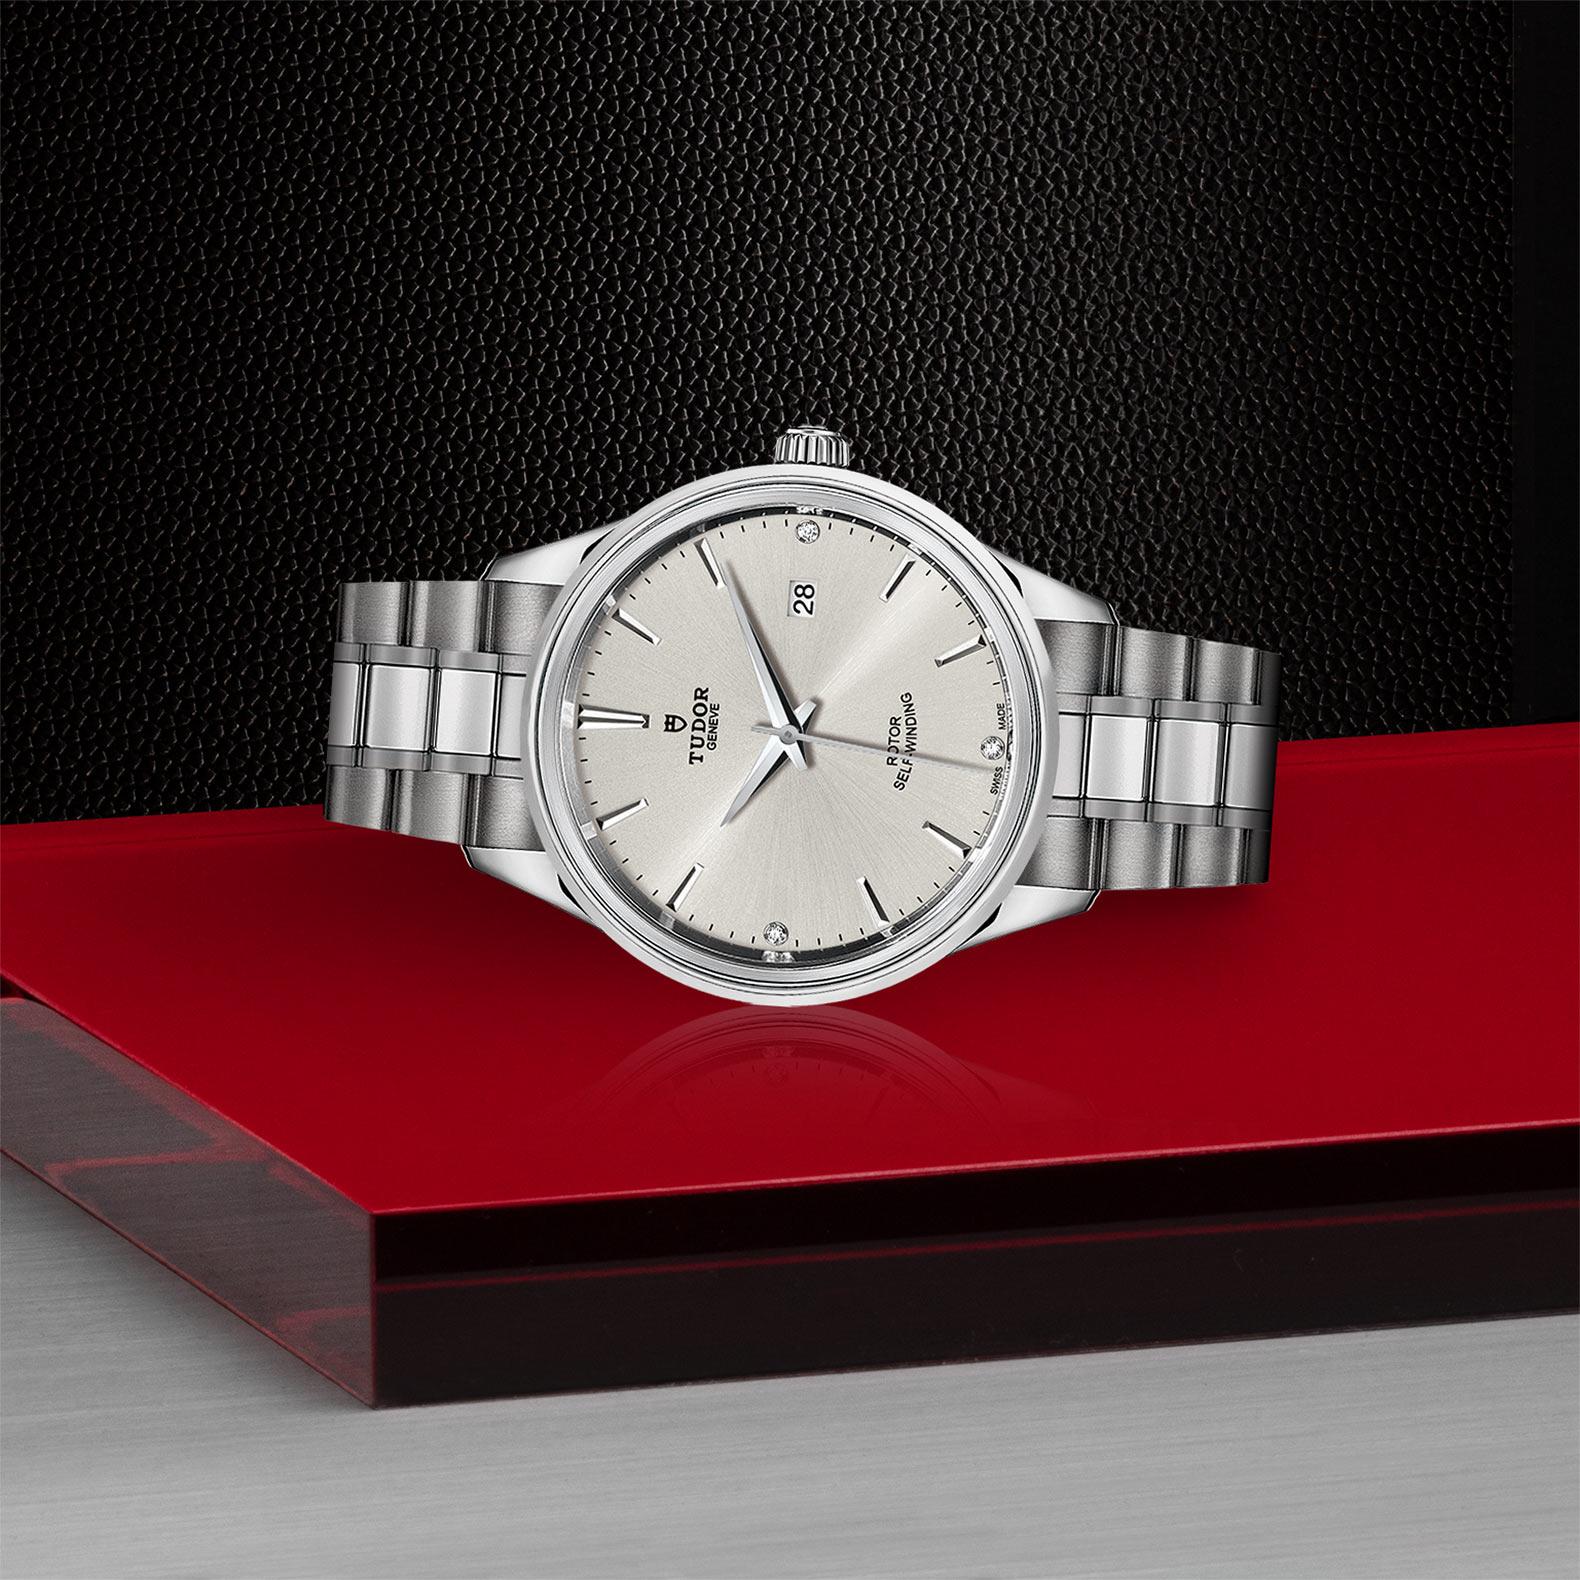 TUDOR Style - M12700-0003